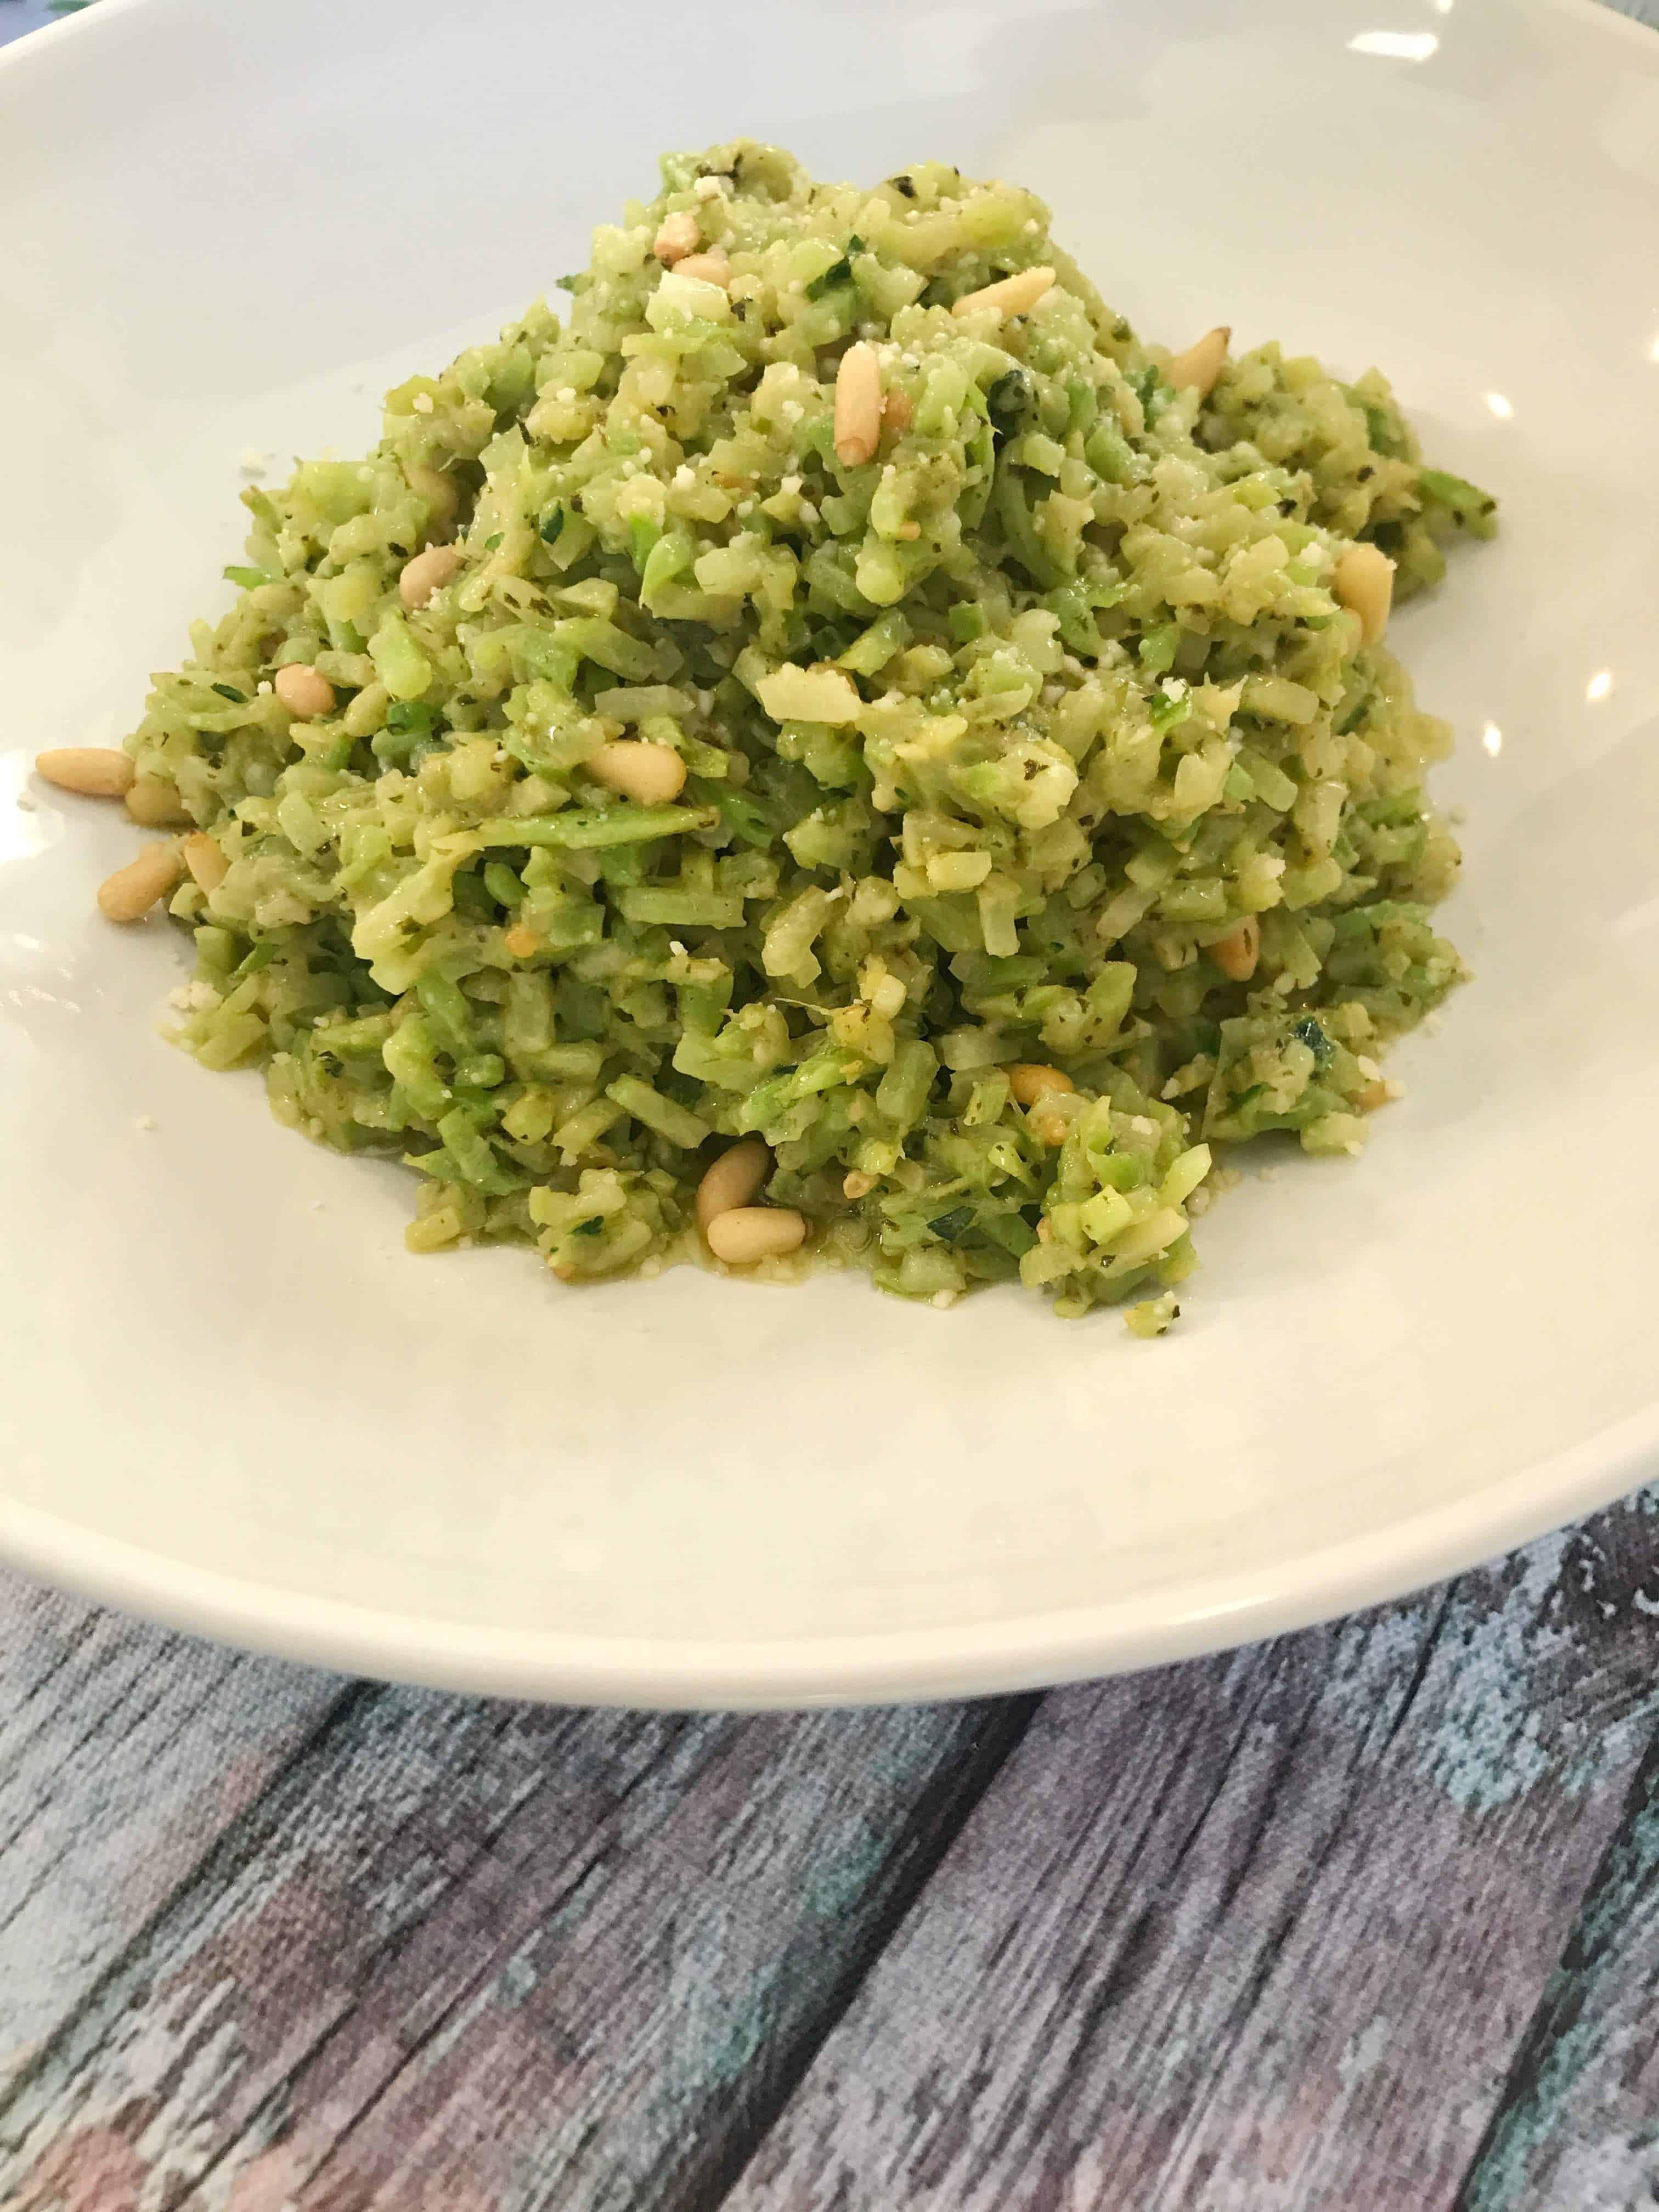 Broccoli Rice with Pesto Pine Nuts and Parmesan